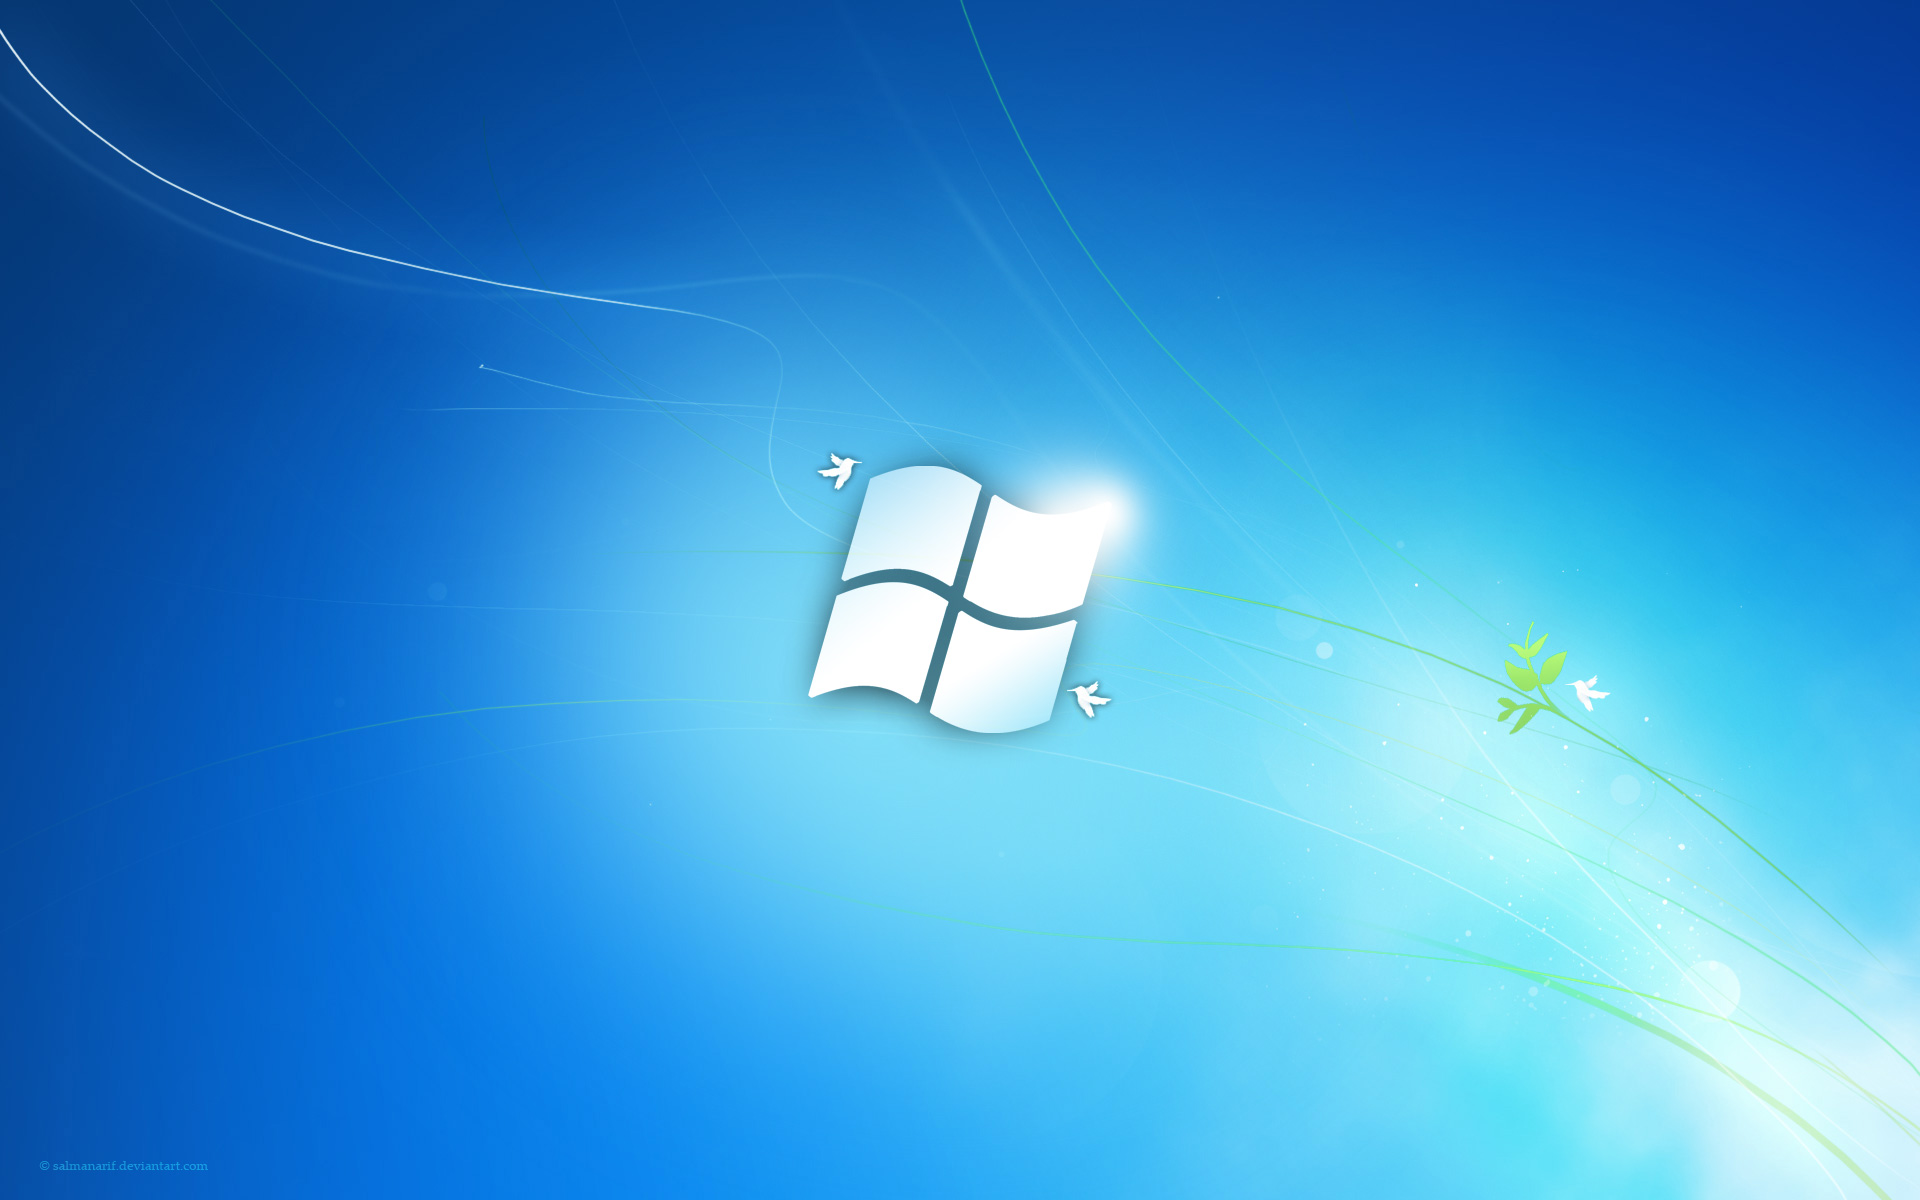 windows 7 starter edition wallpaper 400x250 change windows 7 starter 1920x1200